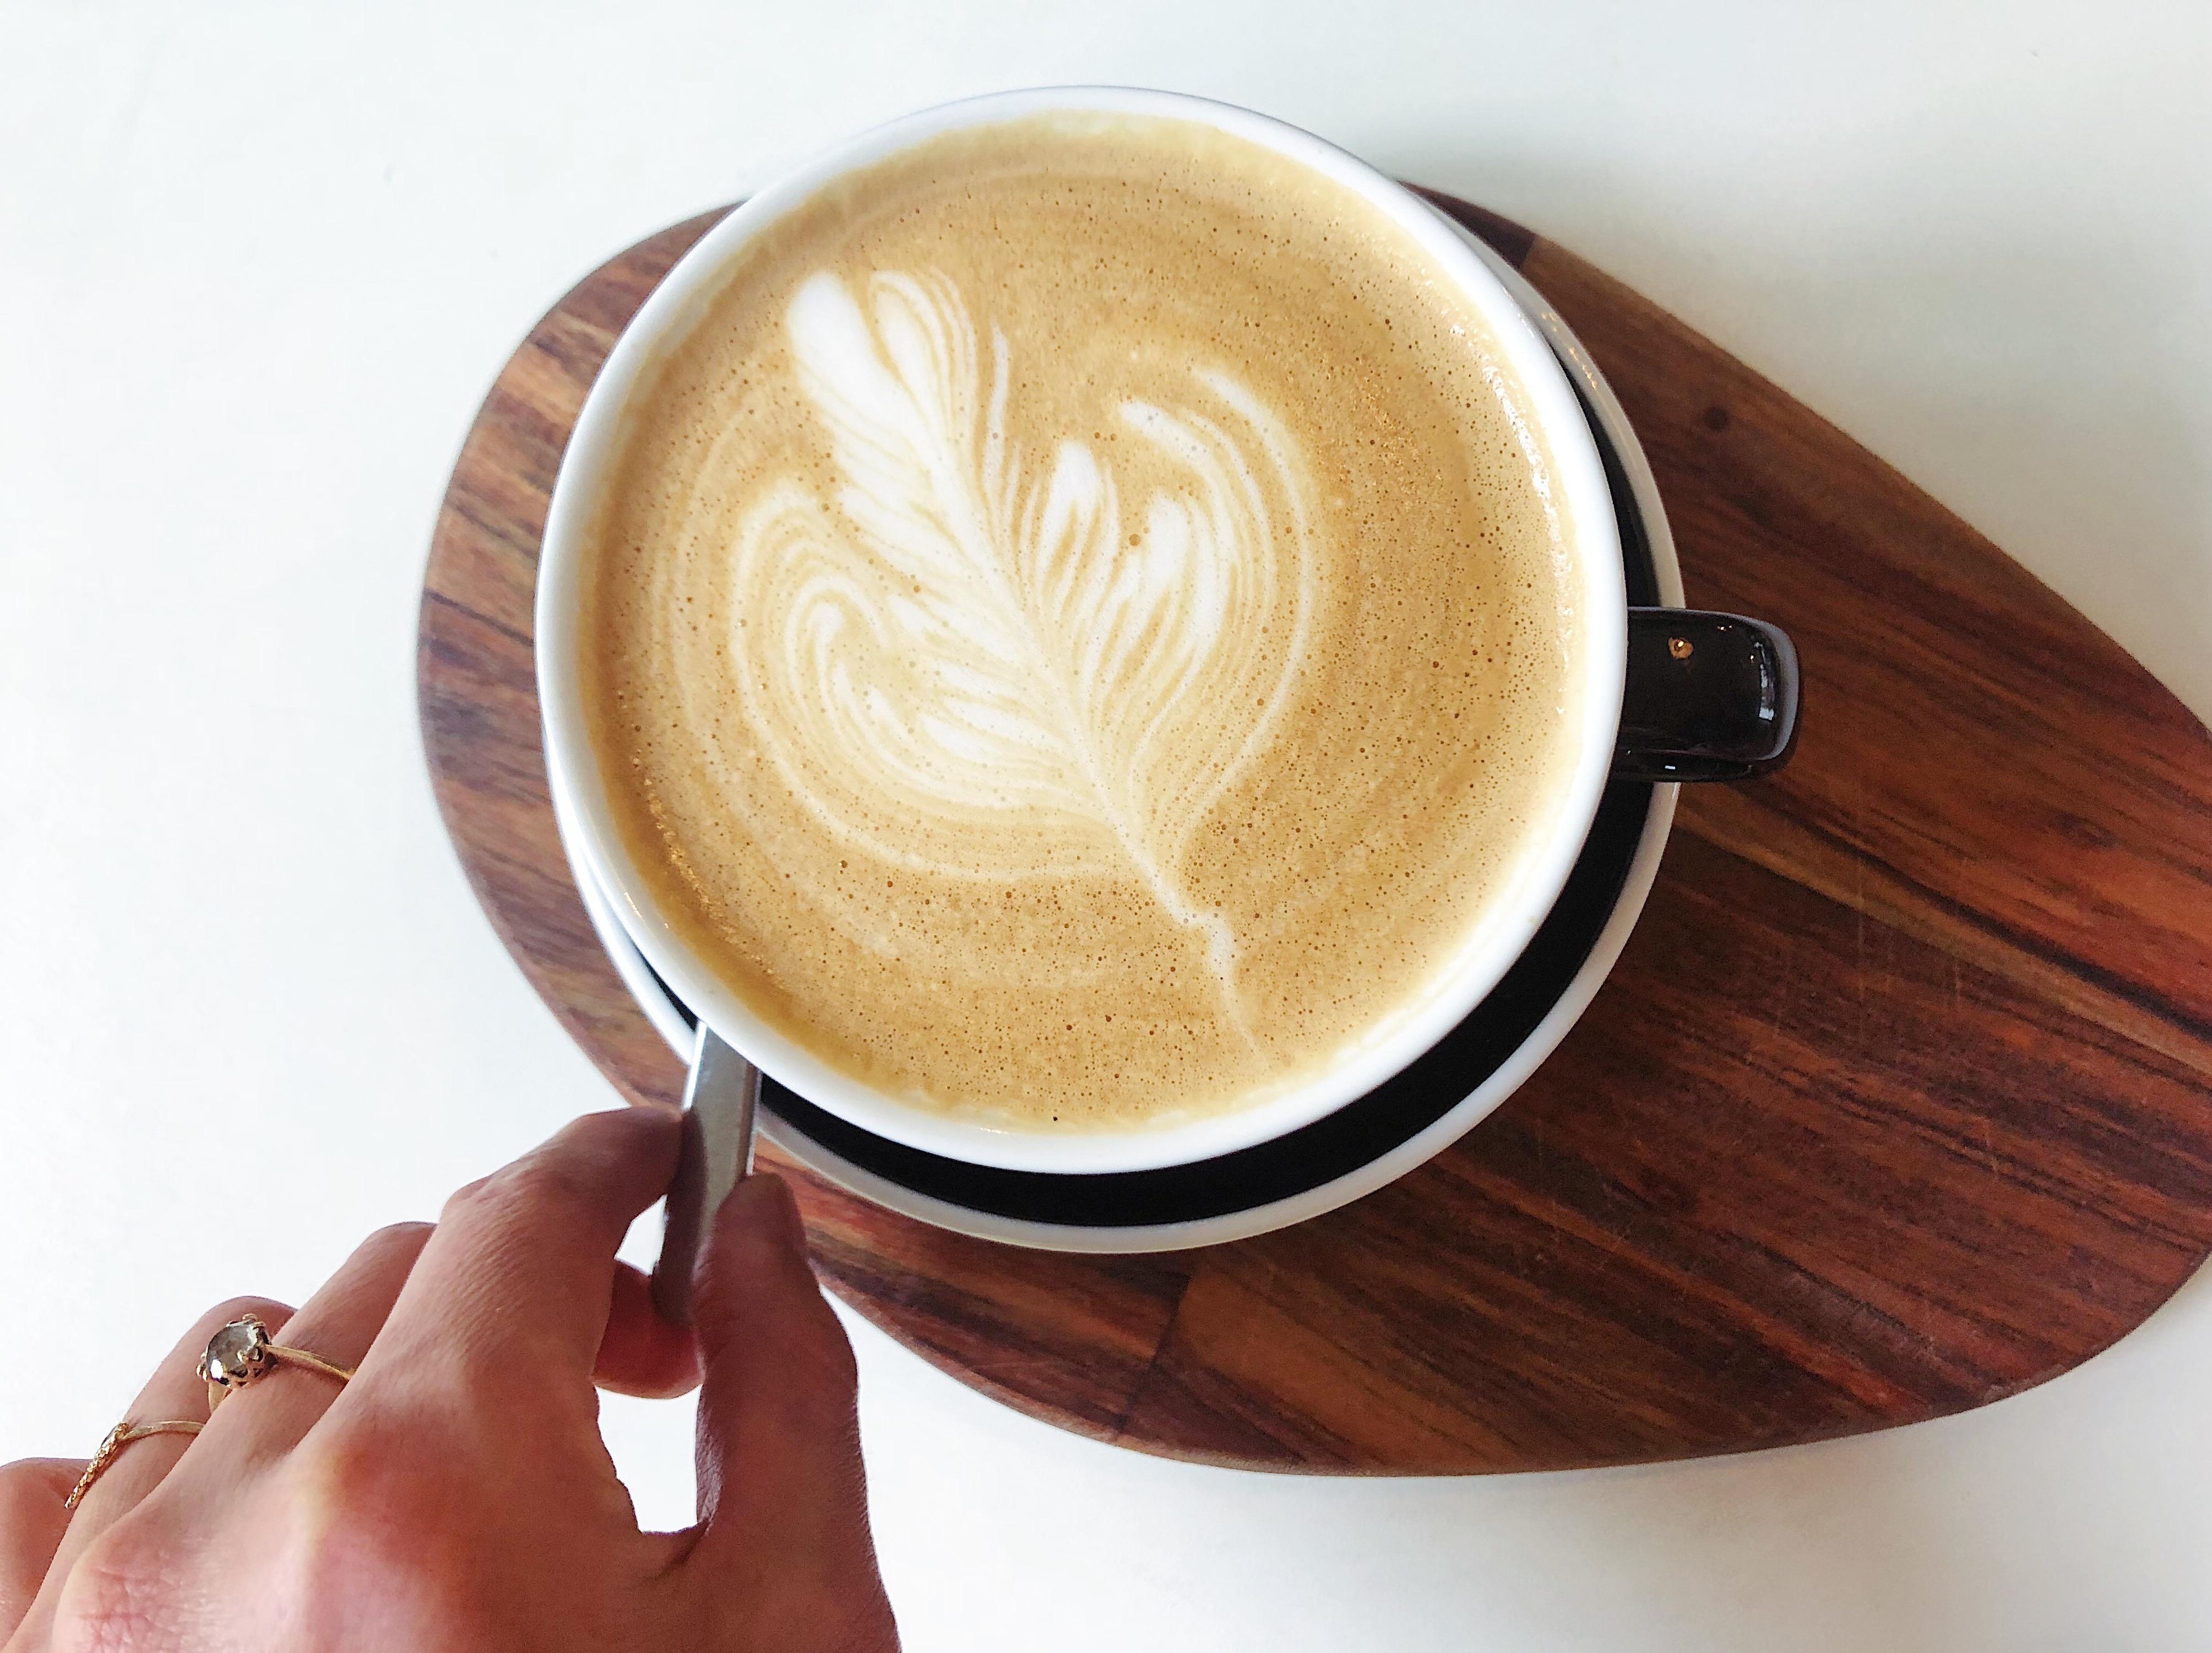 cafe-susann-kaiserslautern-perfektes-cappucino